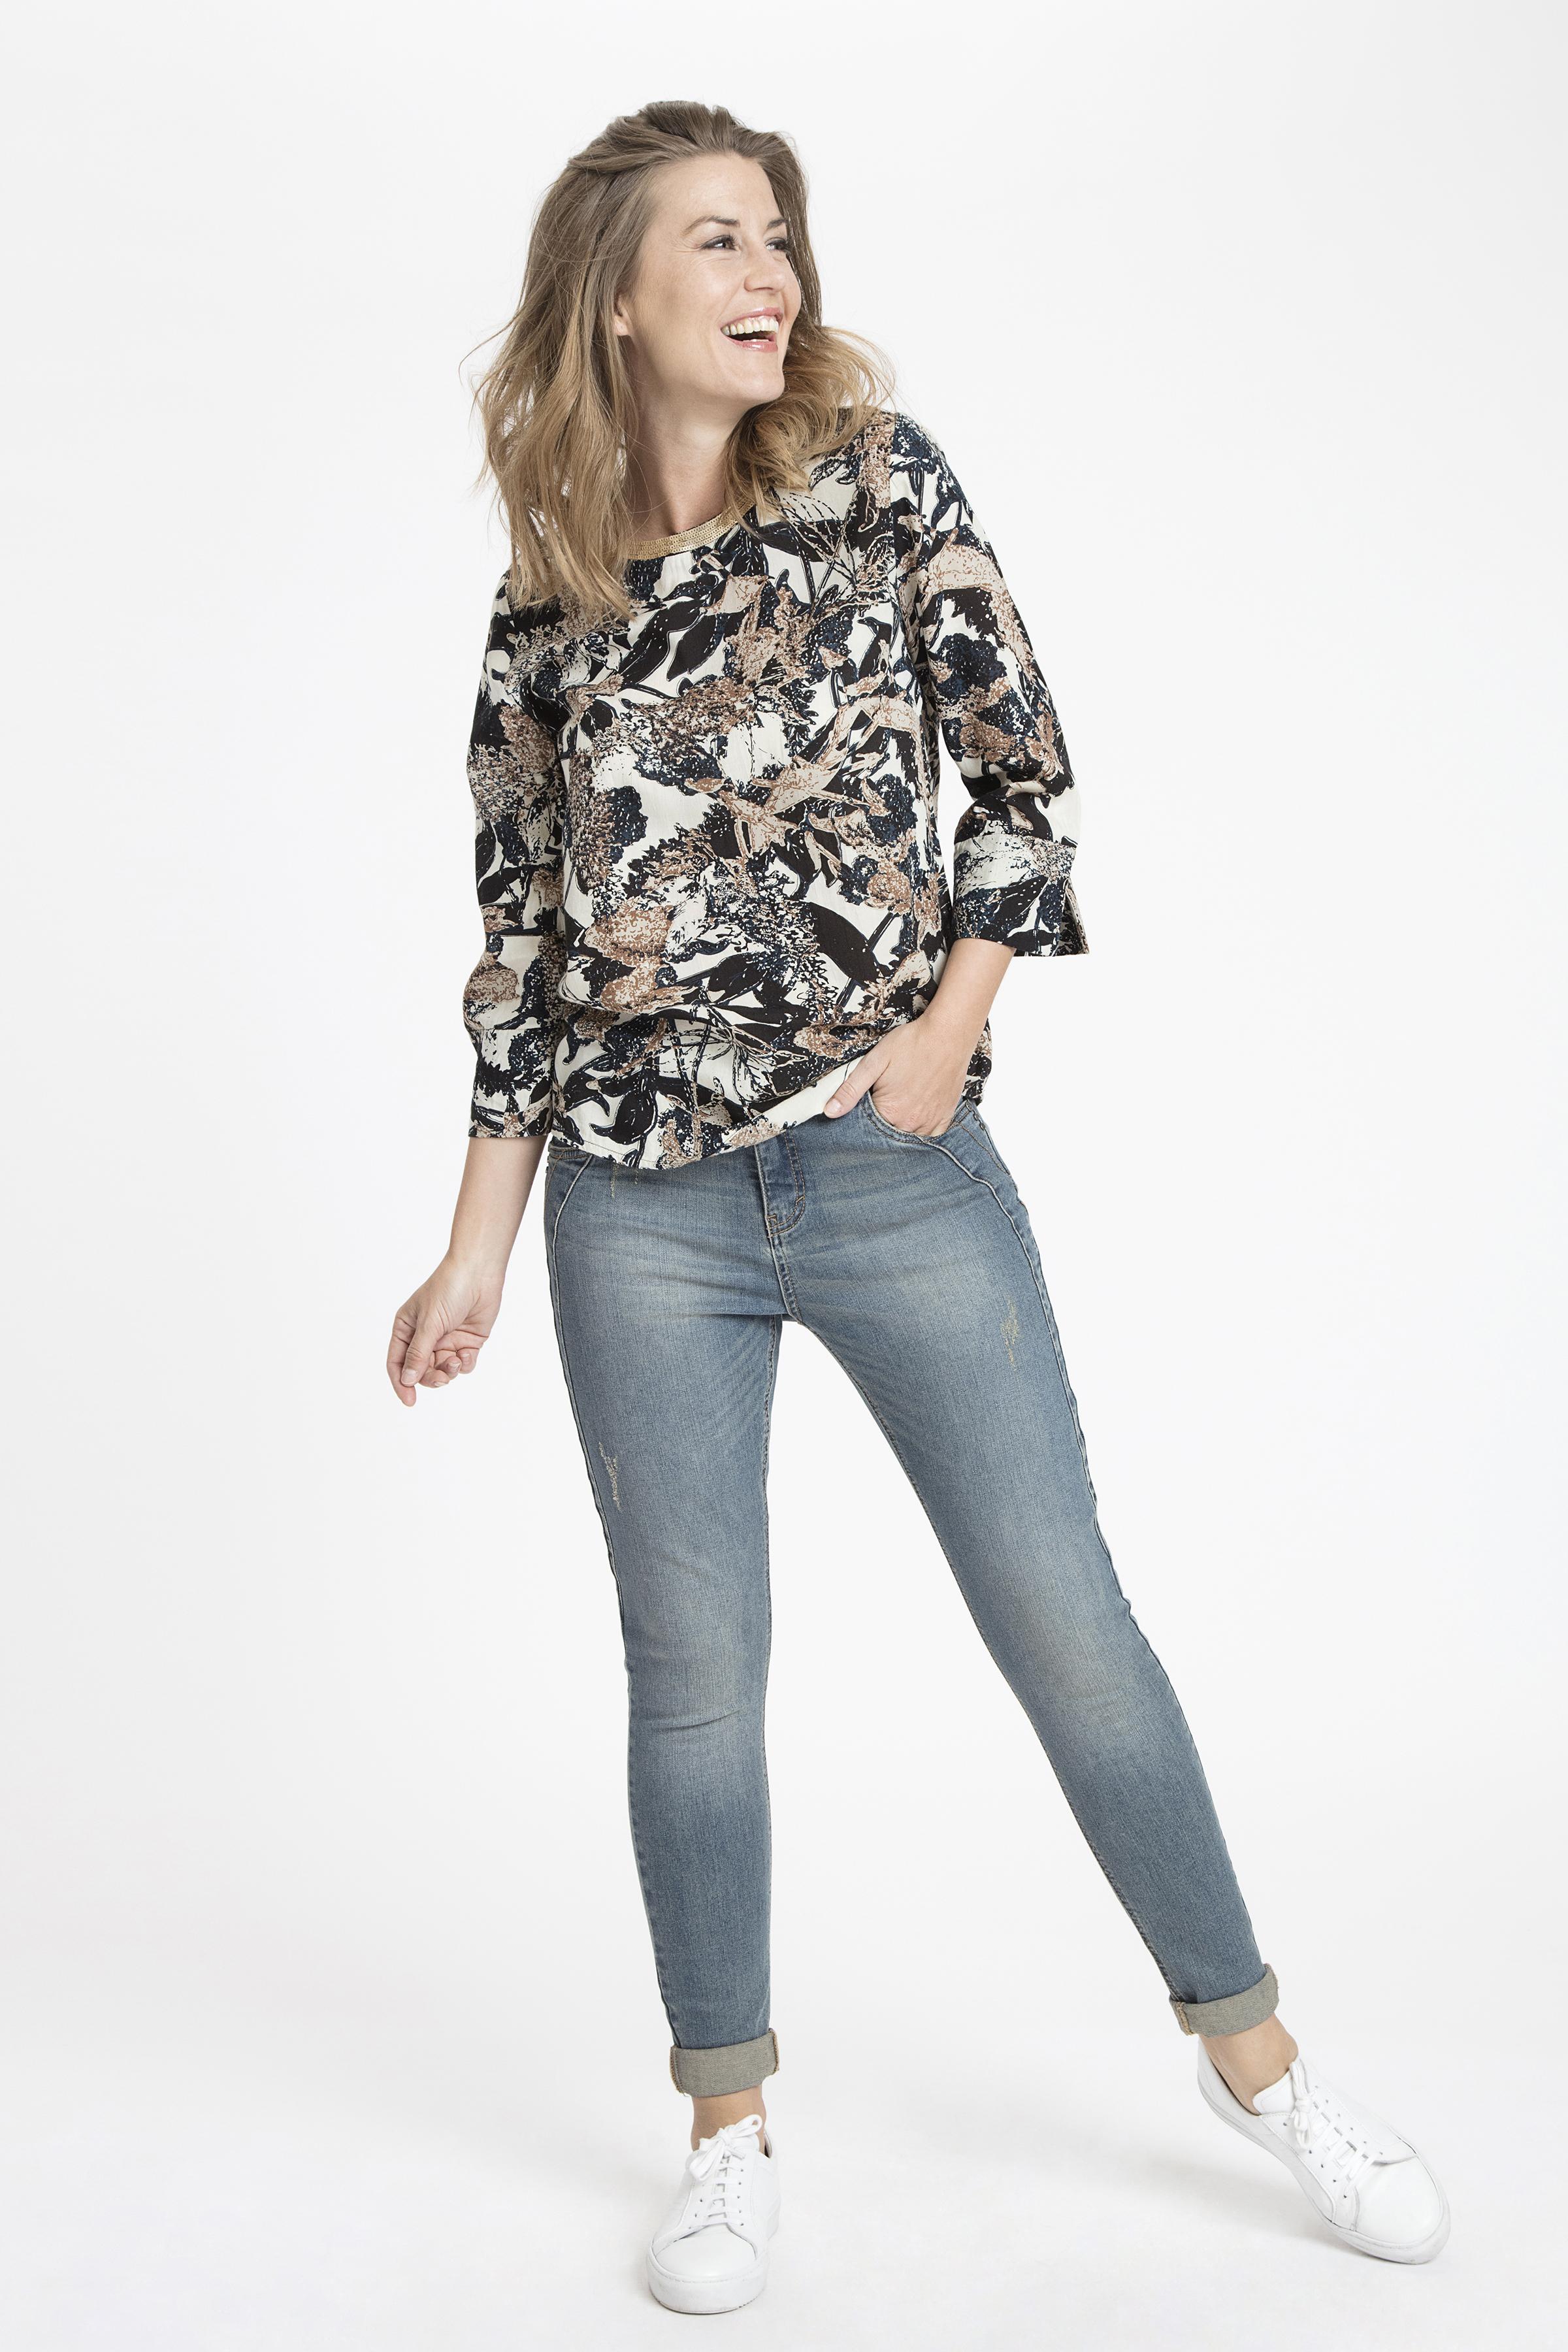 Creme/blå Langærmet bluse fra Bon'A Parte – Køb Creme/blå Langærmet bluse fra str. S-2XL her